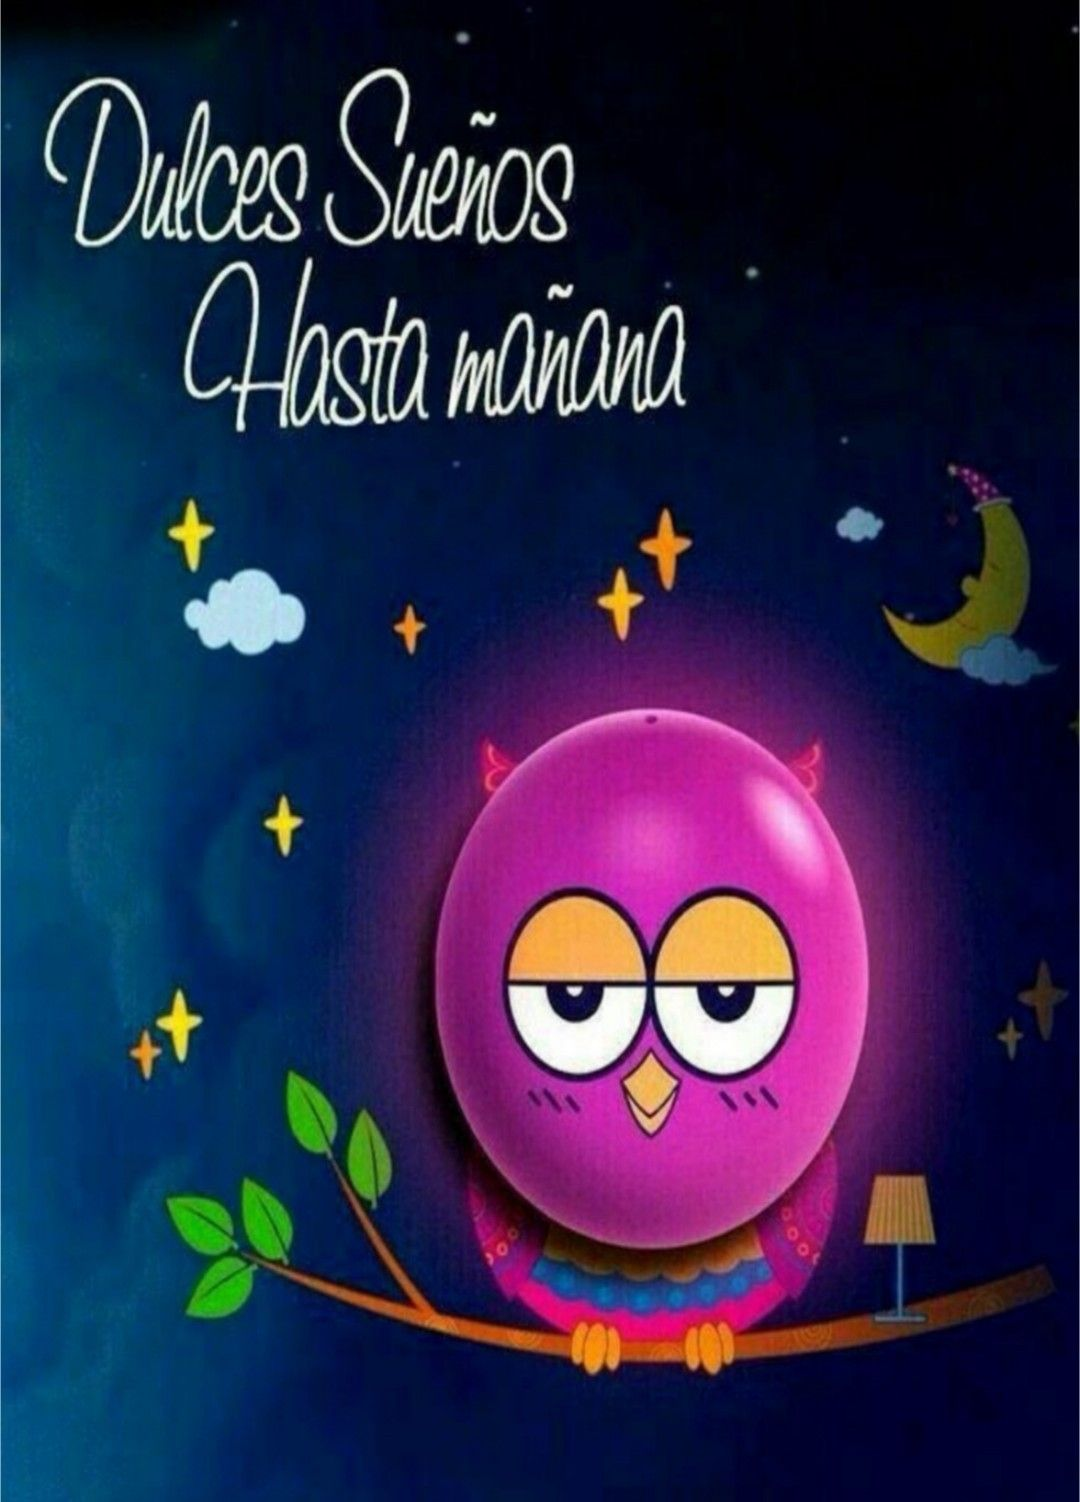 Pin De Amorina Lopez En Buenas Noches Buenas Noches Meme Mensajes De Buenas Noches Gifts De Buenas Noches